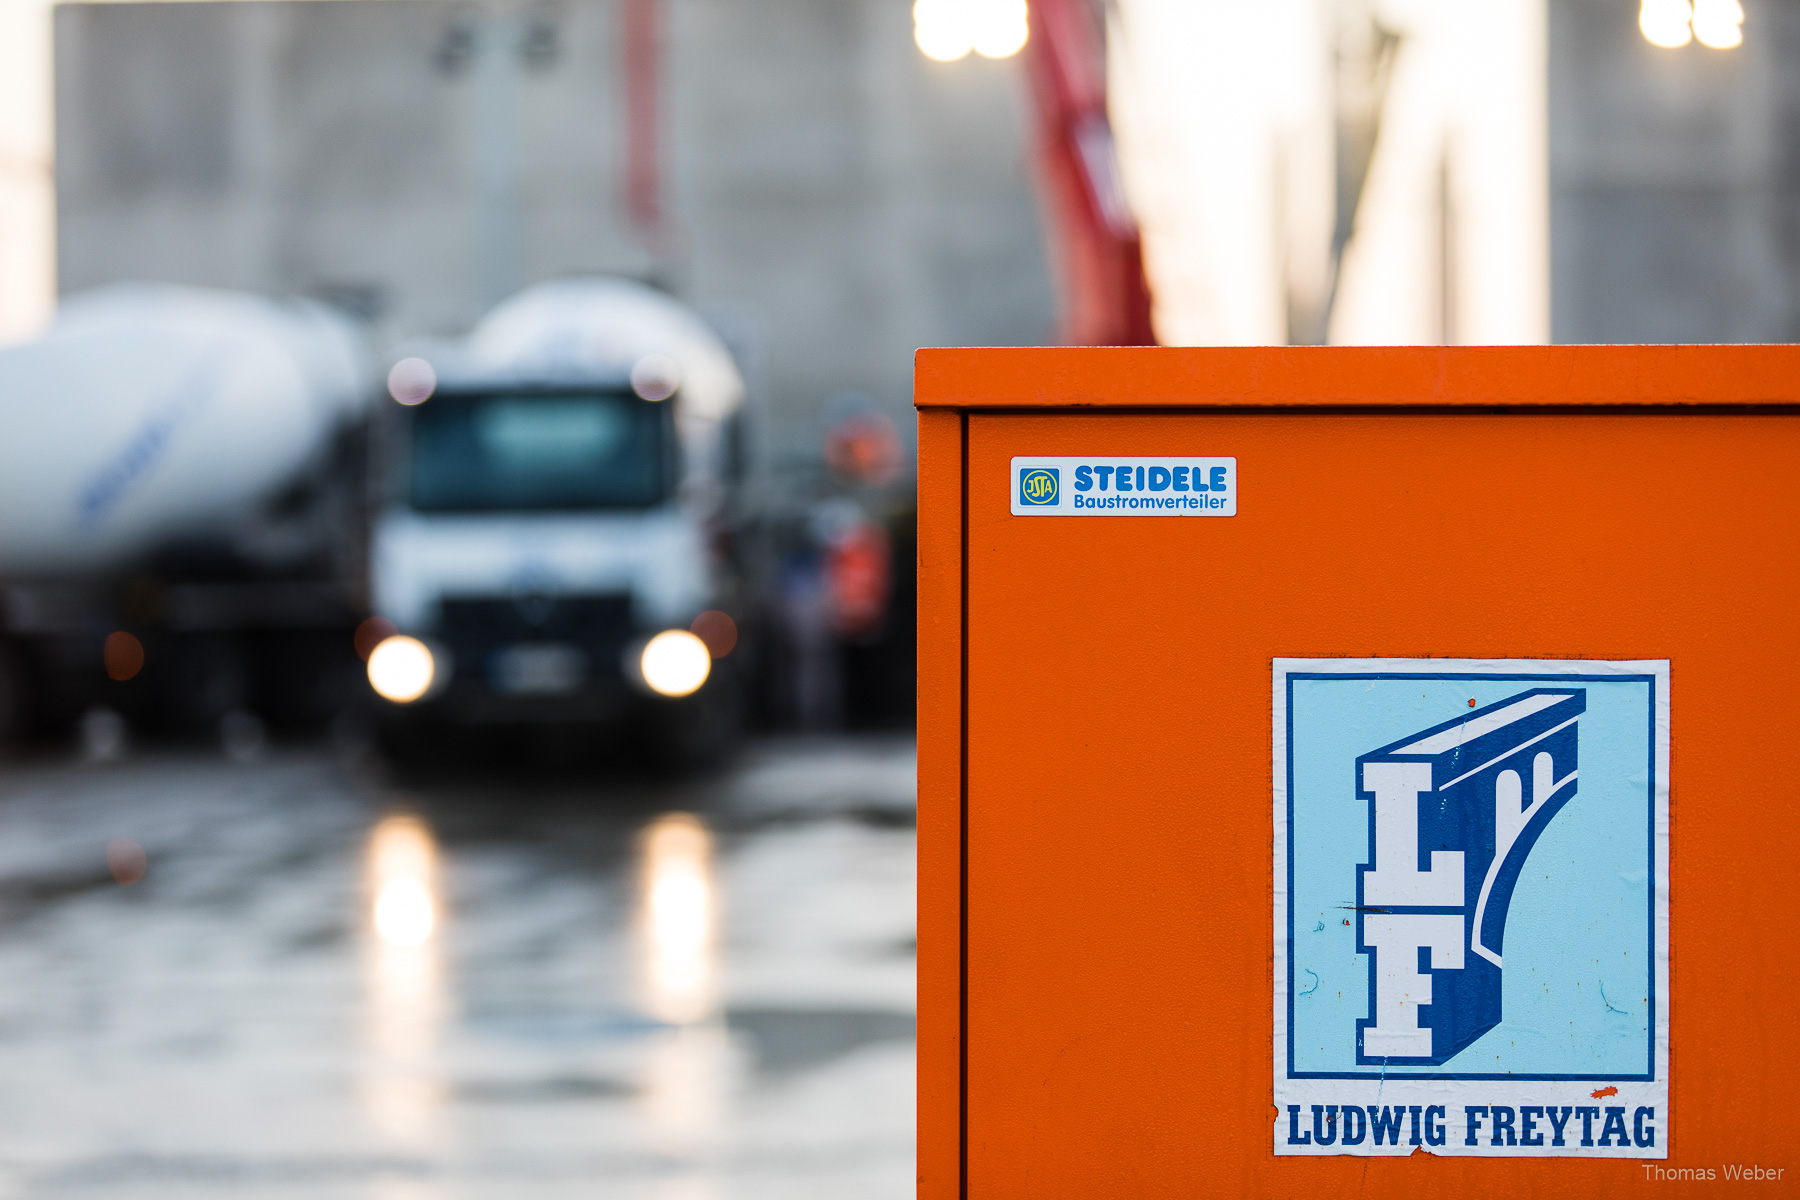 Reportagefotos von Ludwig Freytag, Fotograf Thomas Weber aus Oldenburg